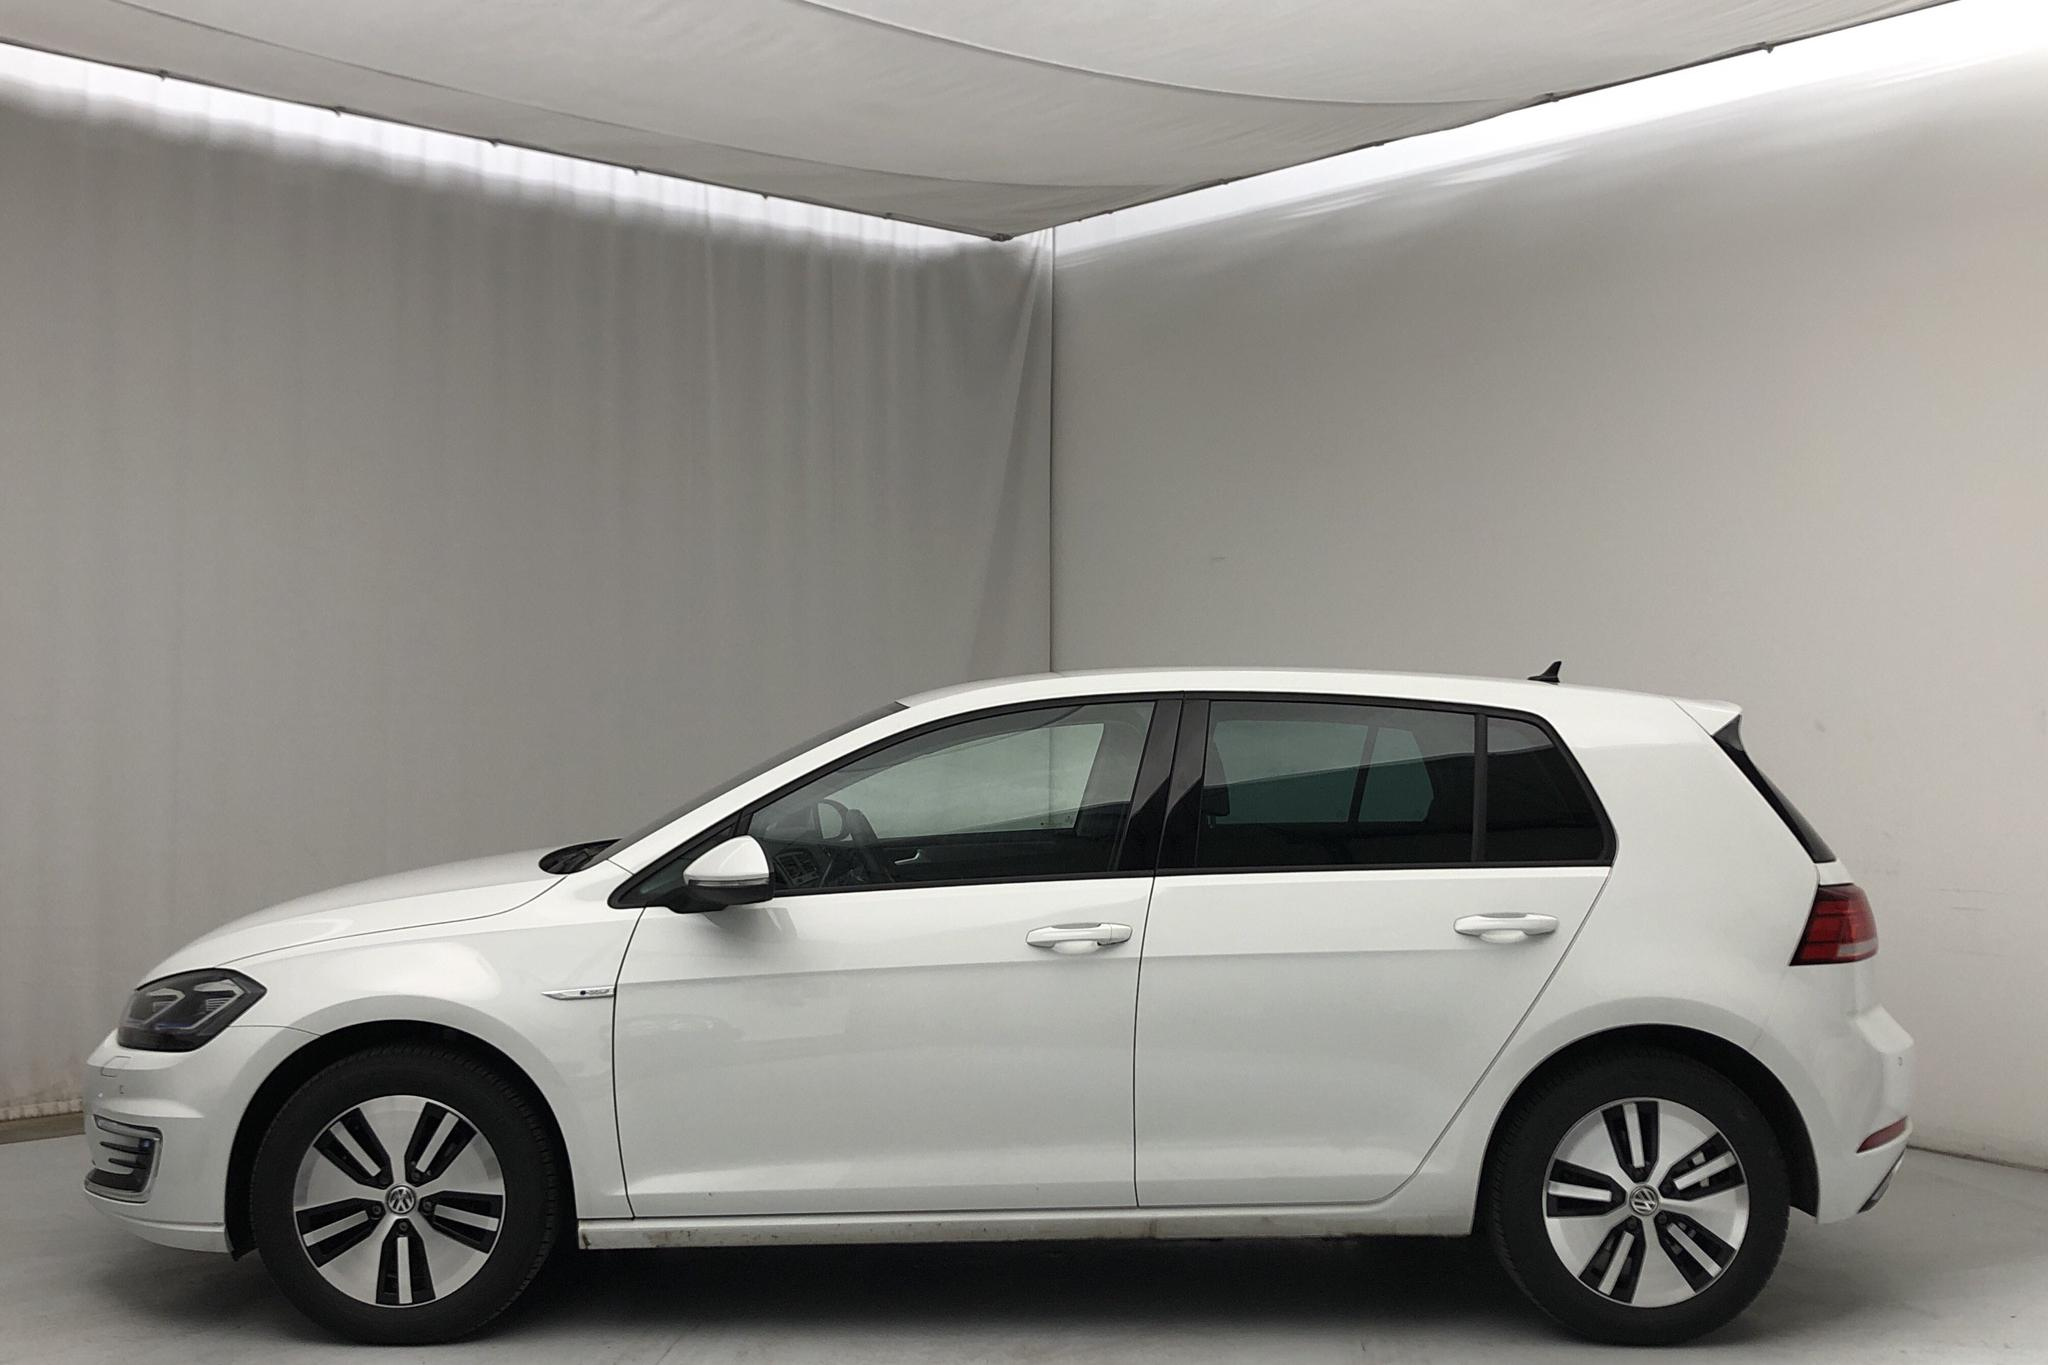 VW e-Golf VII 5dr (136hk) - 11 420 km - Automatic - white - 2019